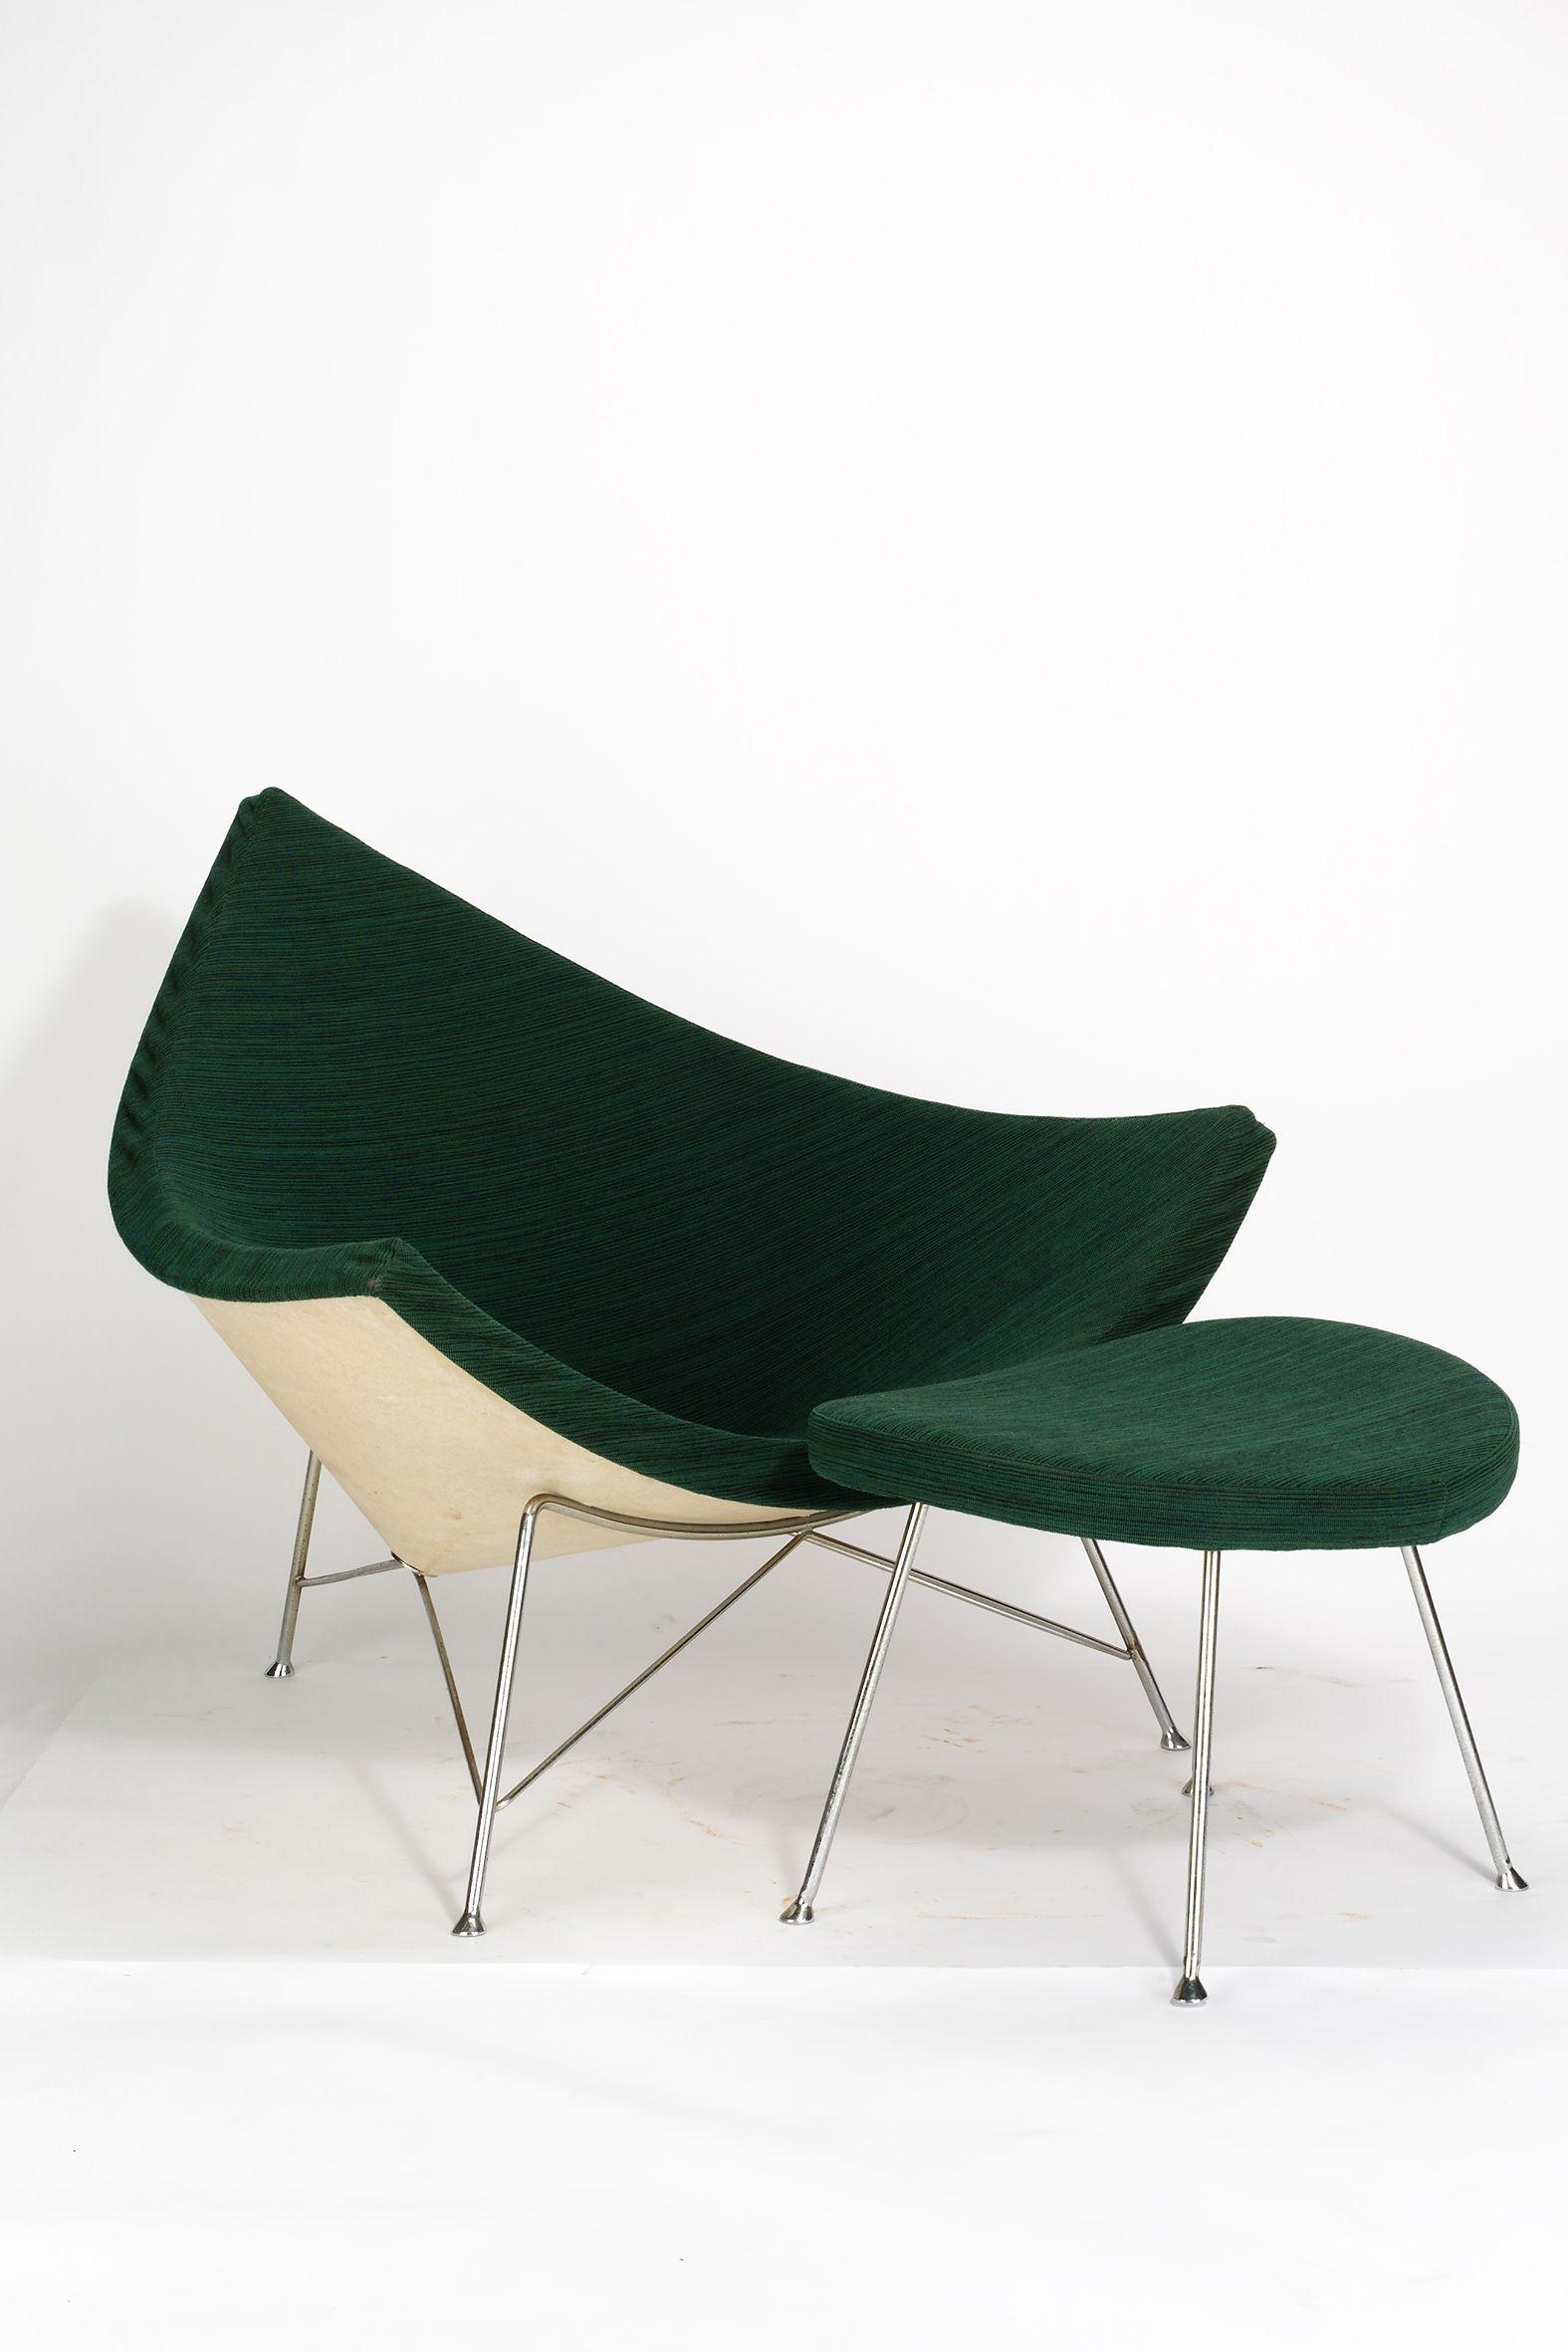 Georg nelson coconut chair ottoman 1955 chairdesign